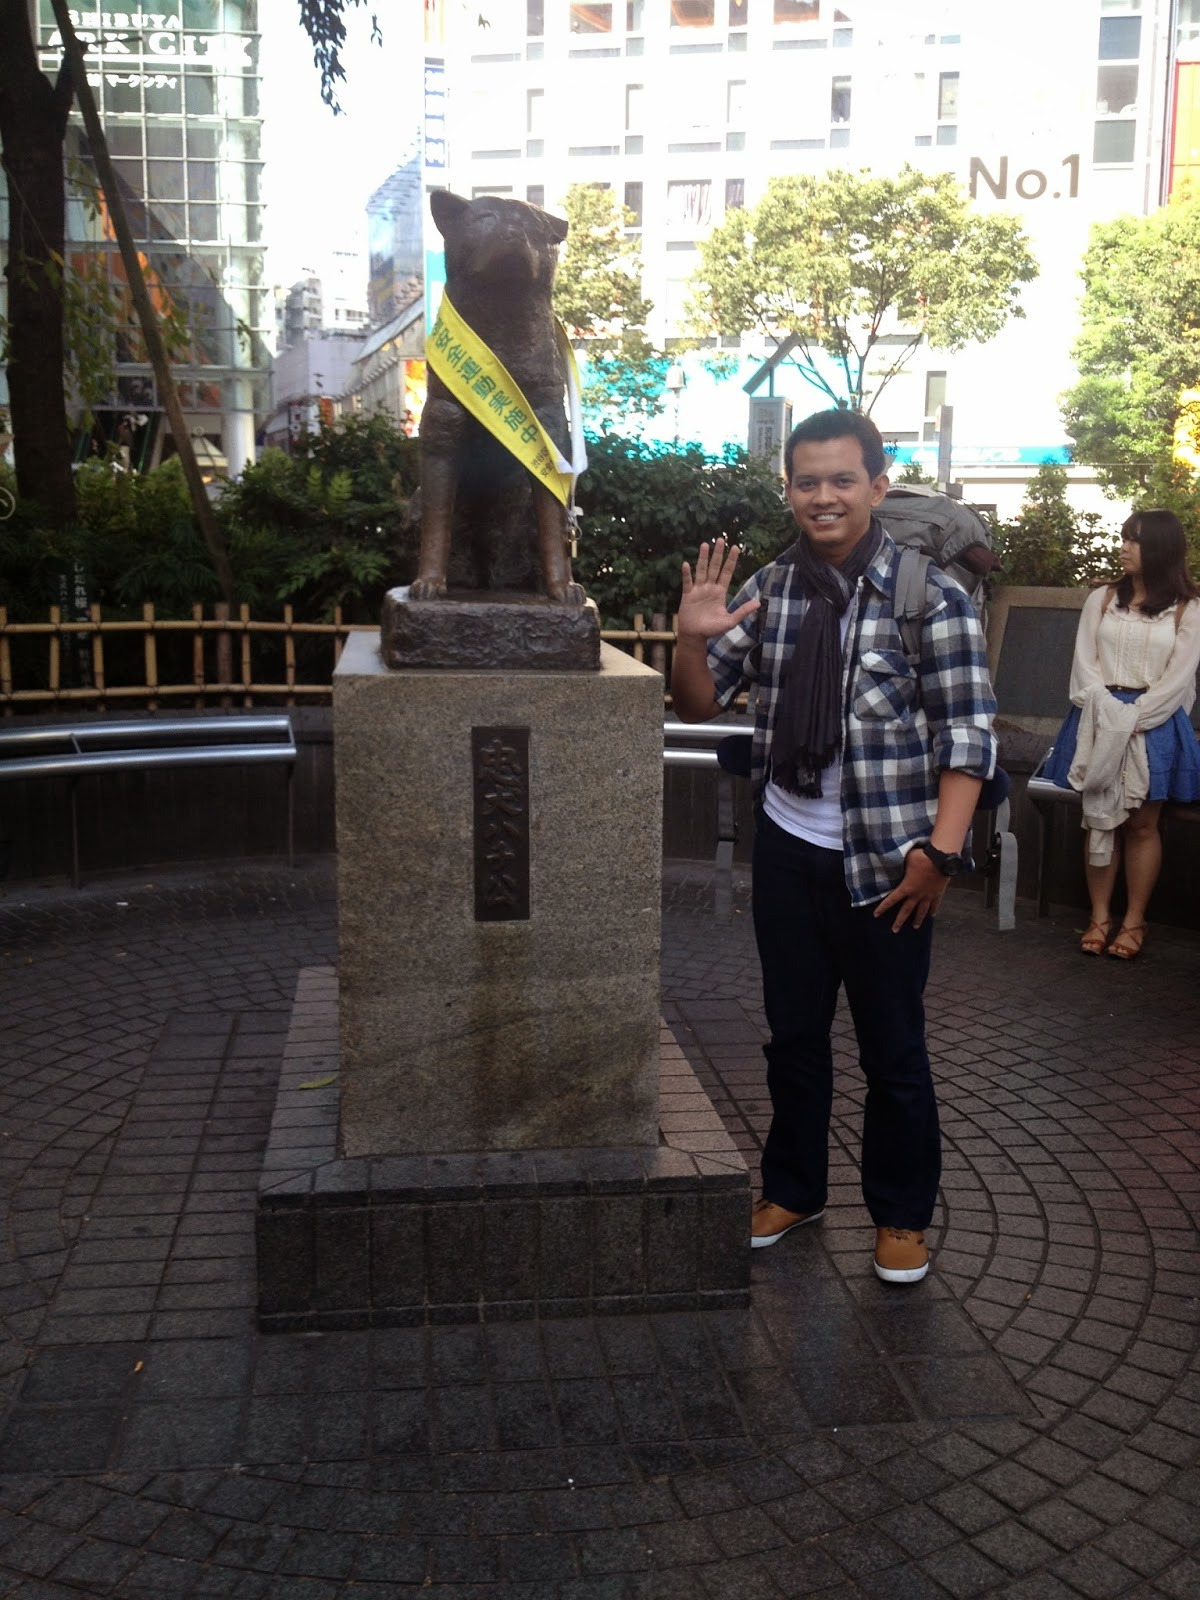 Panduan Wisata dan Transportasi Tokyo Jepang  Shibuya